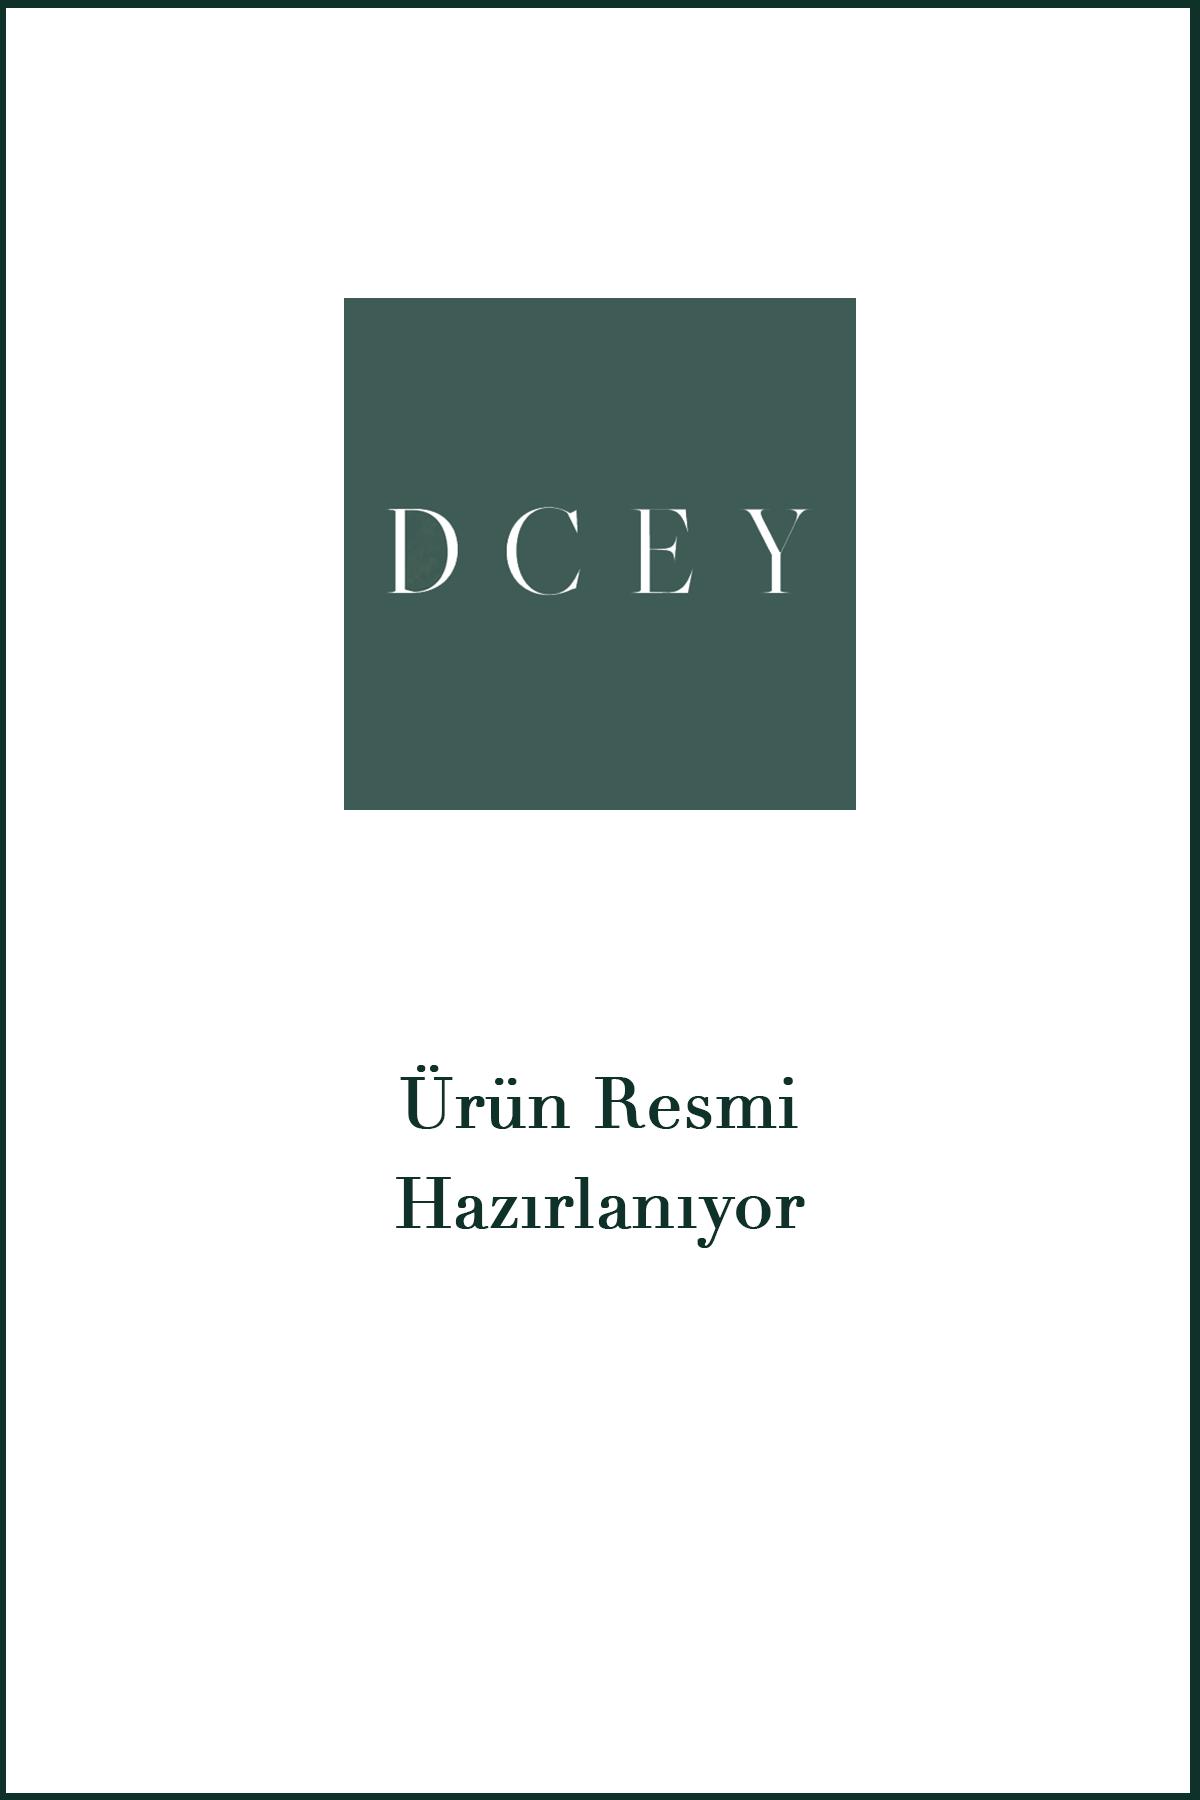 Deka Kırmızı Elbise